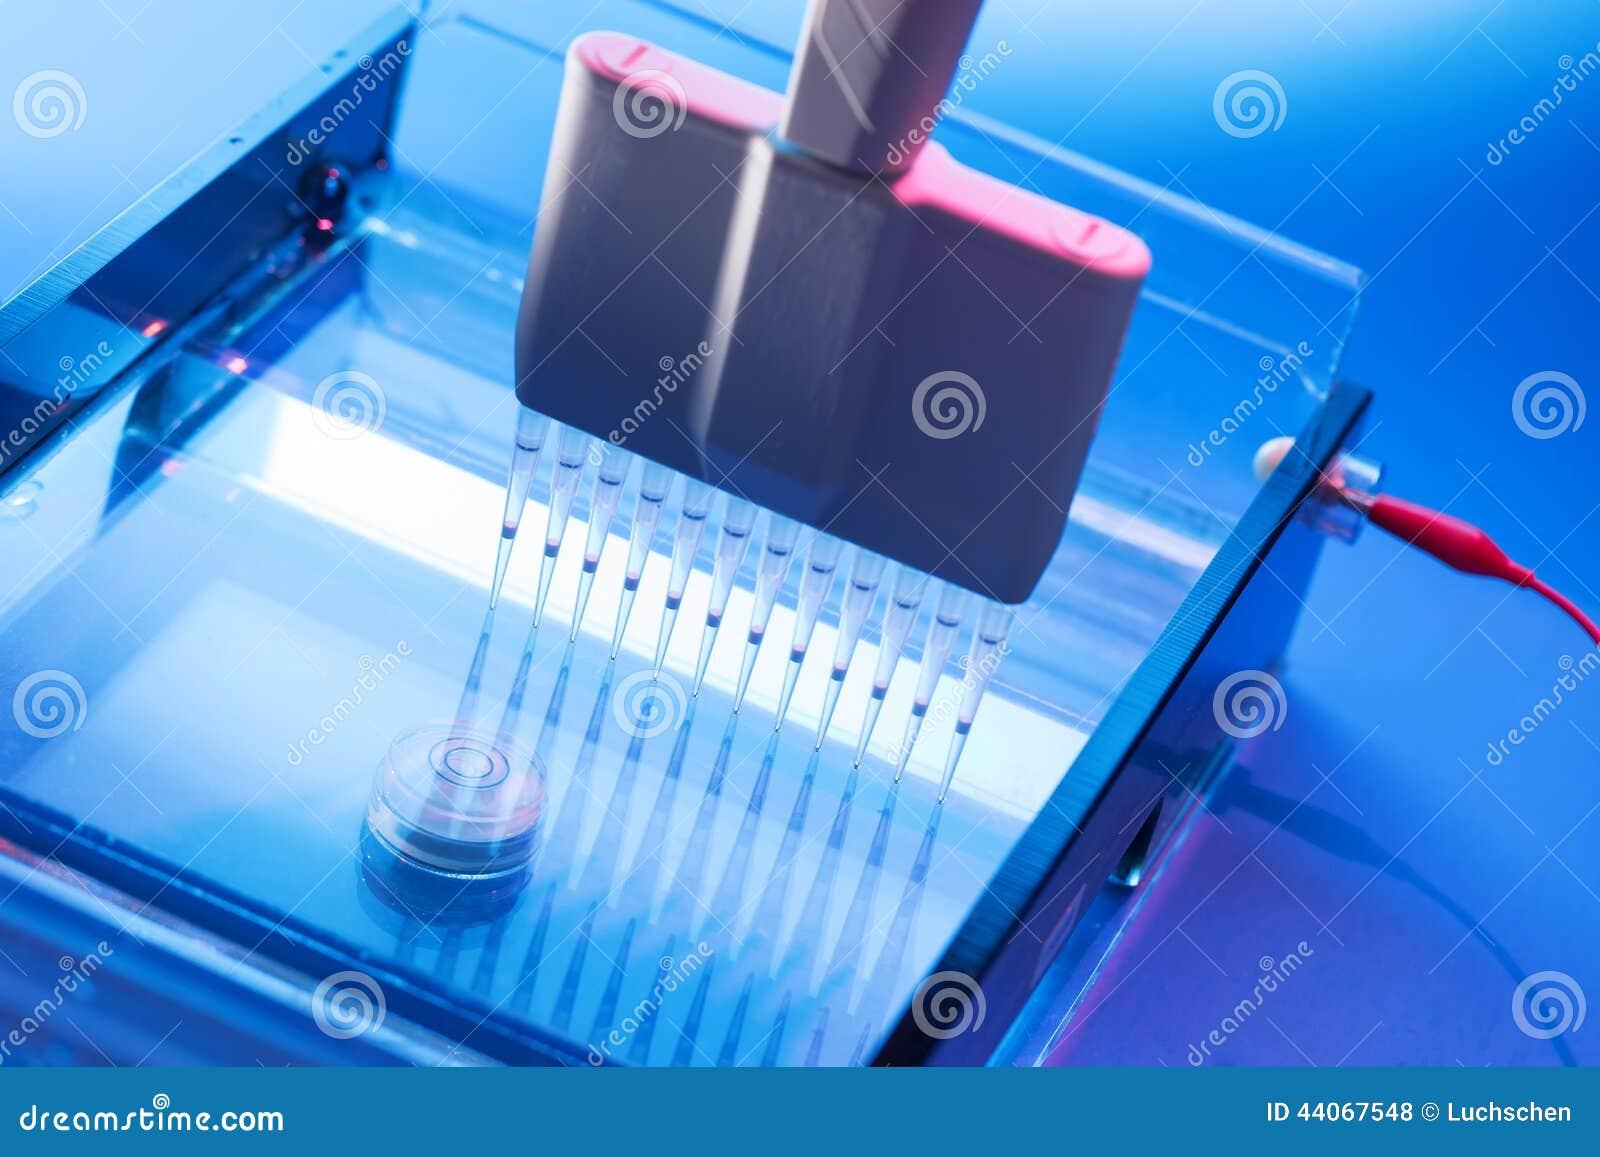 loading dna samples onto an agarose gel electrophoresis